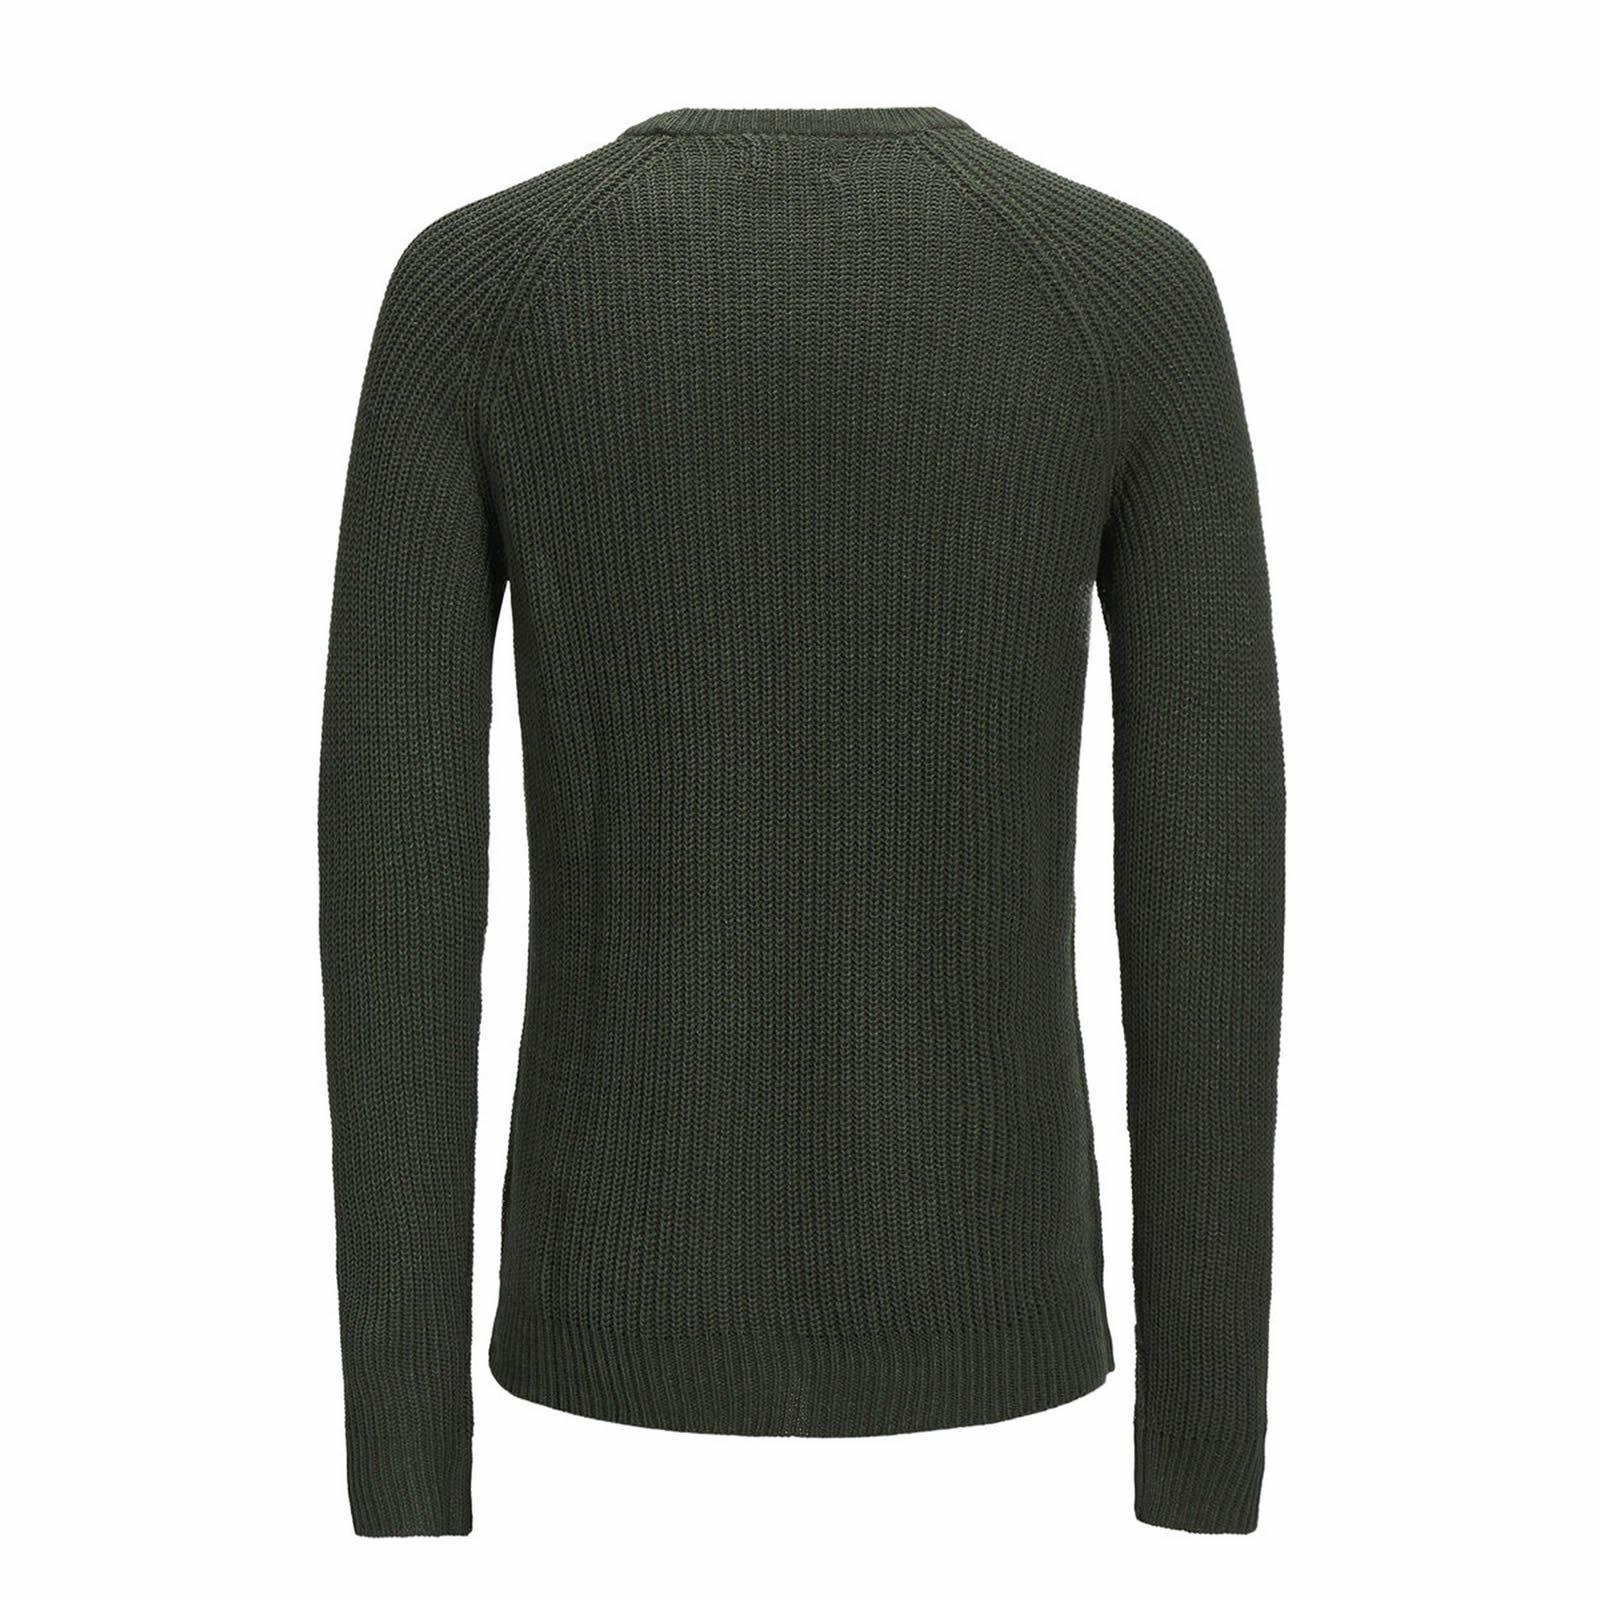 Jack-amp-Jones-Panneau-Pull-homme-a-encolure-ras-du-cou-Long-Tricot-Pull-Over-Sweater miniature 9